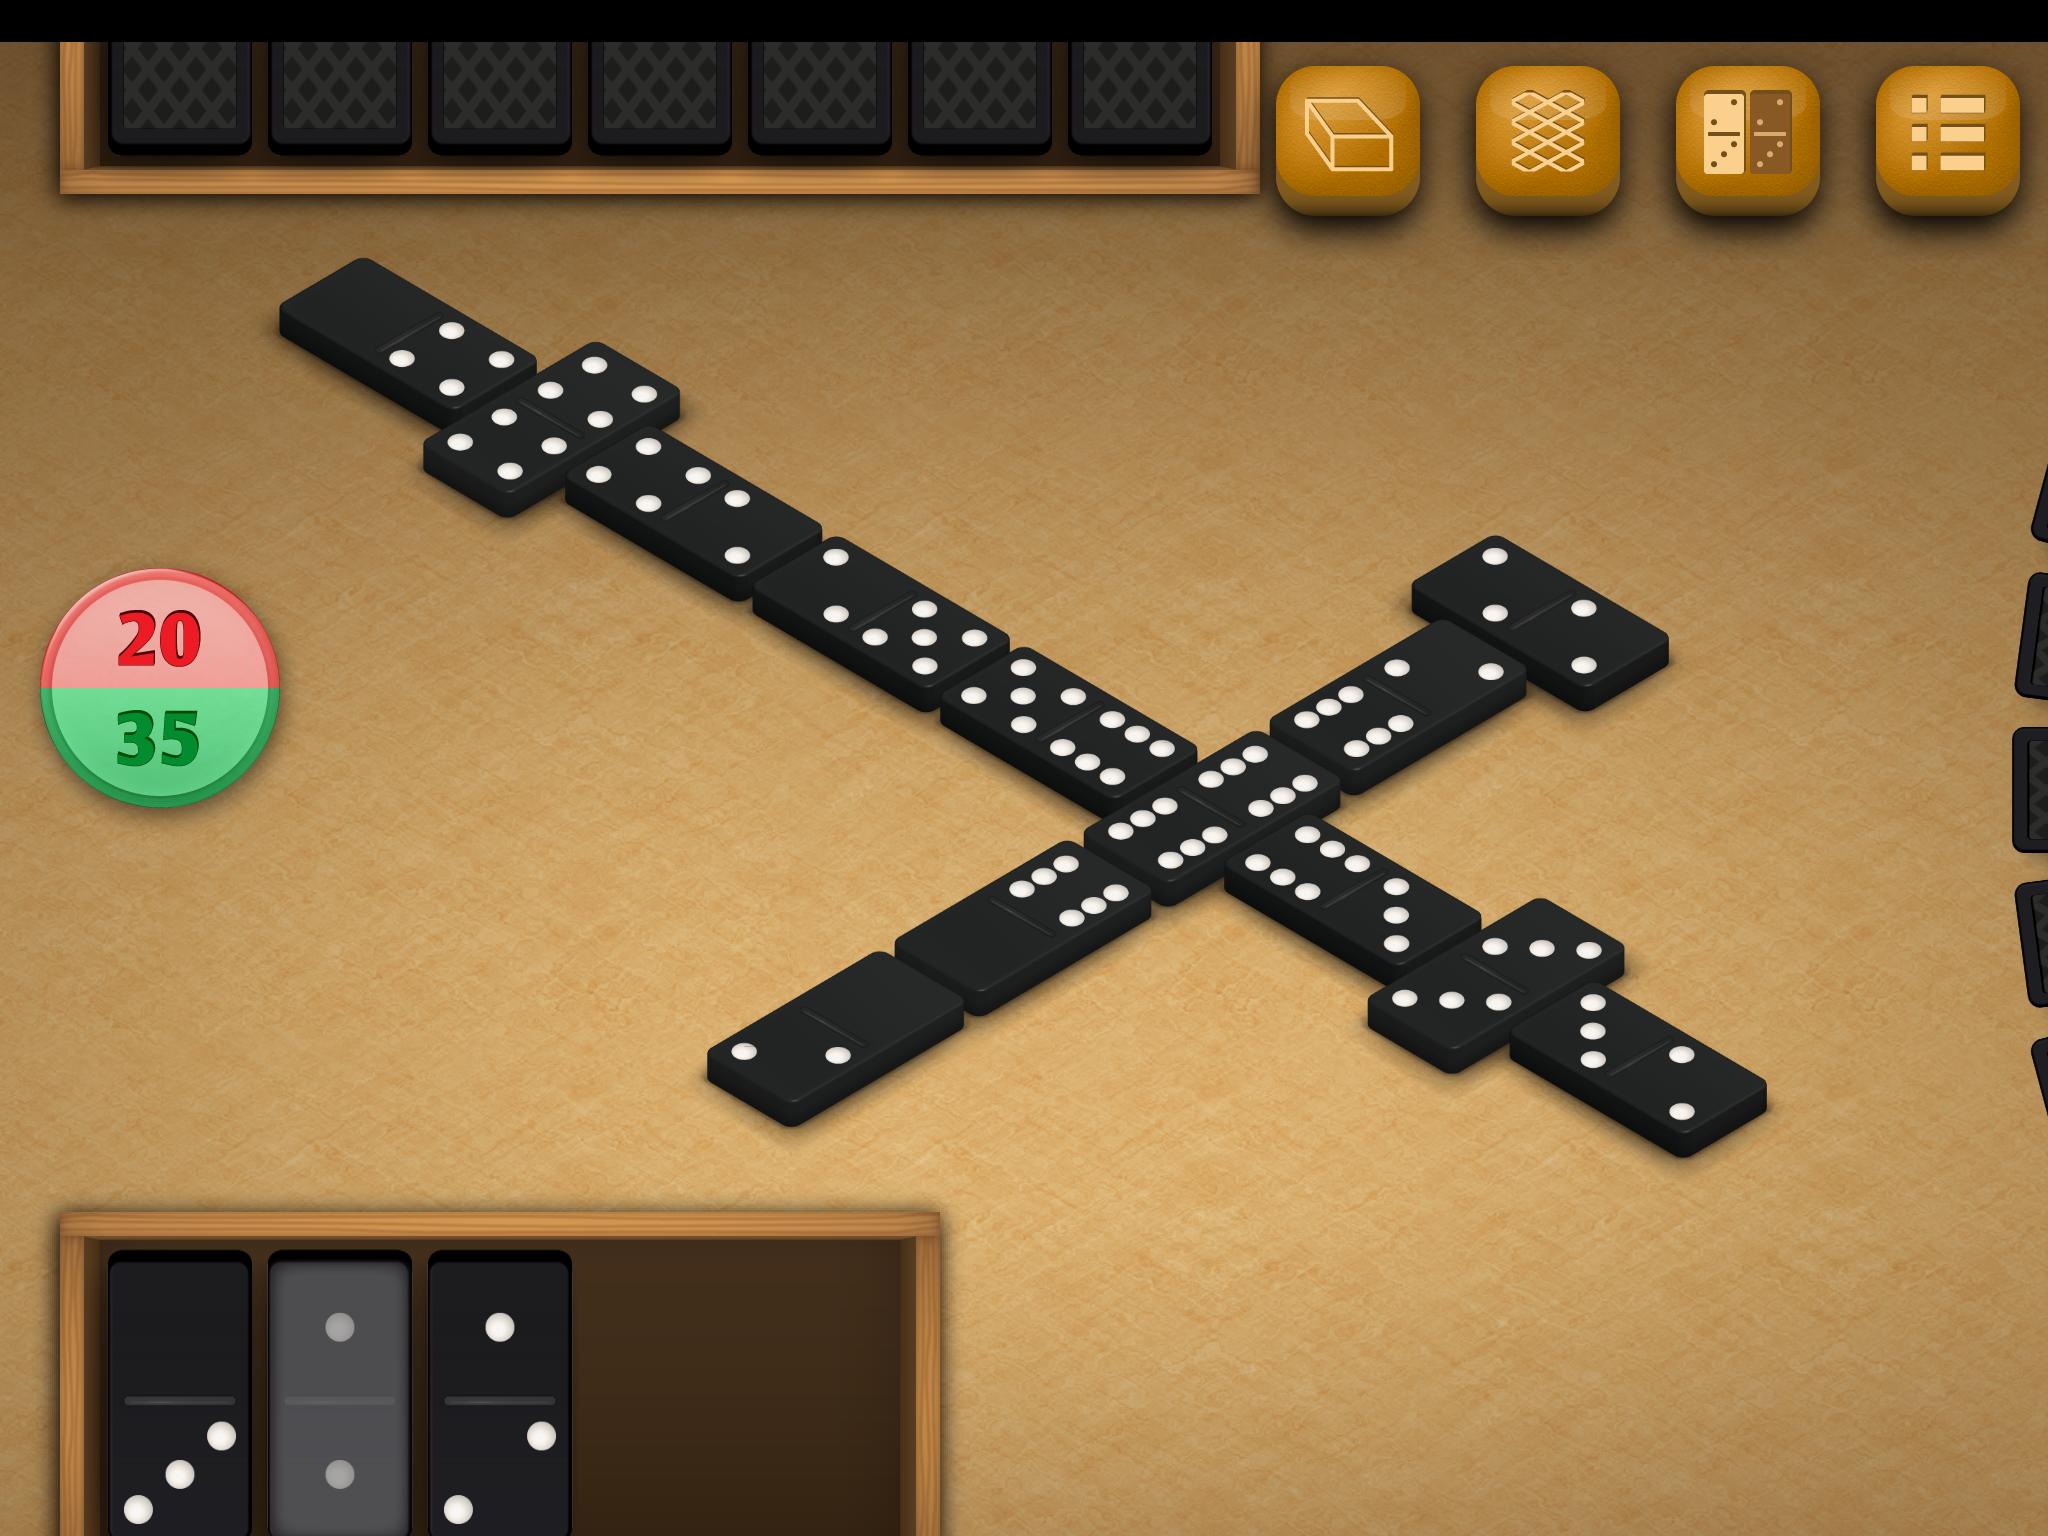 Dominos by DoraLogic, dementia-friendly app (alternative display 2)